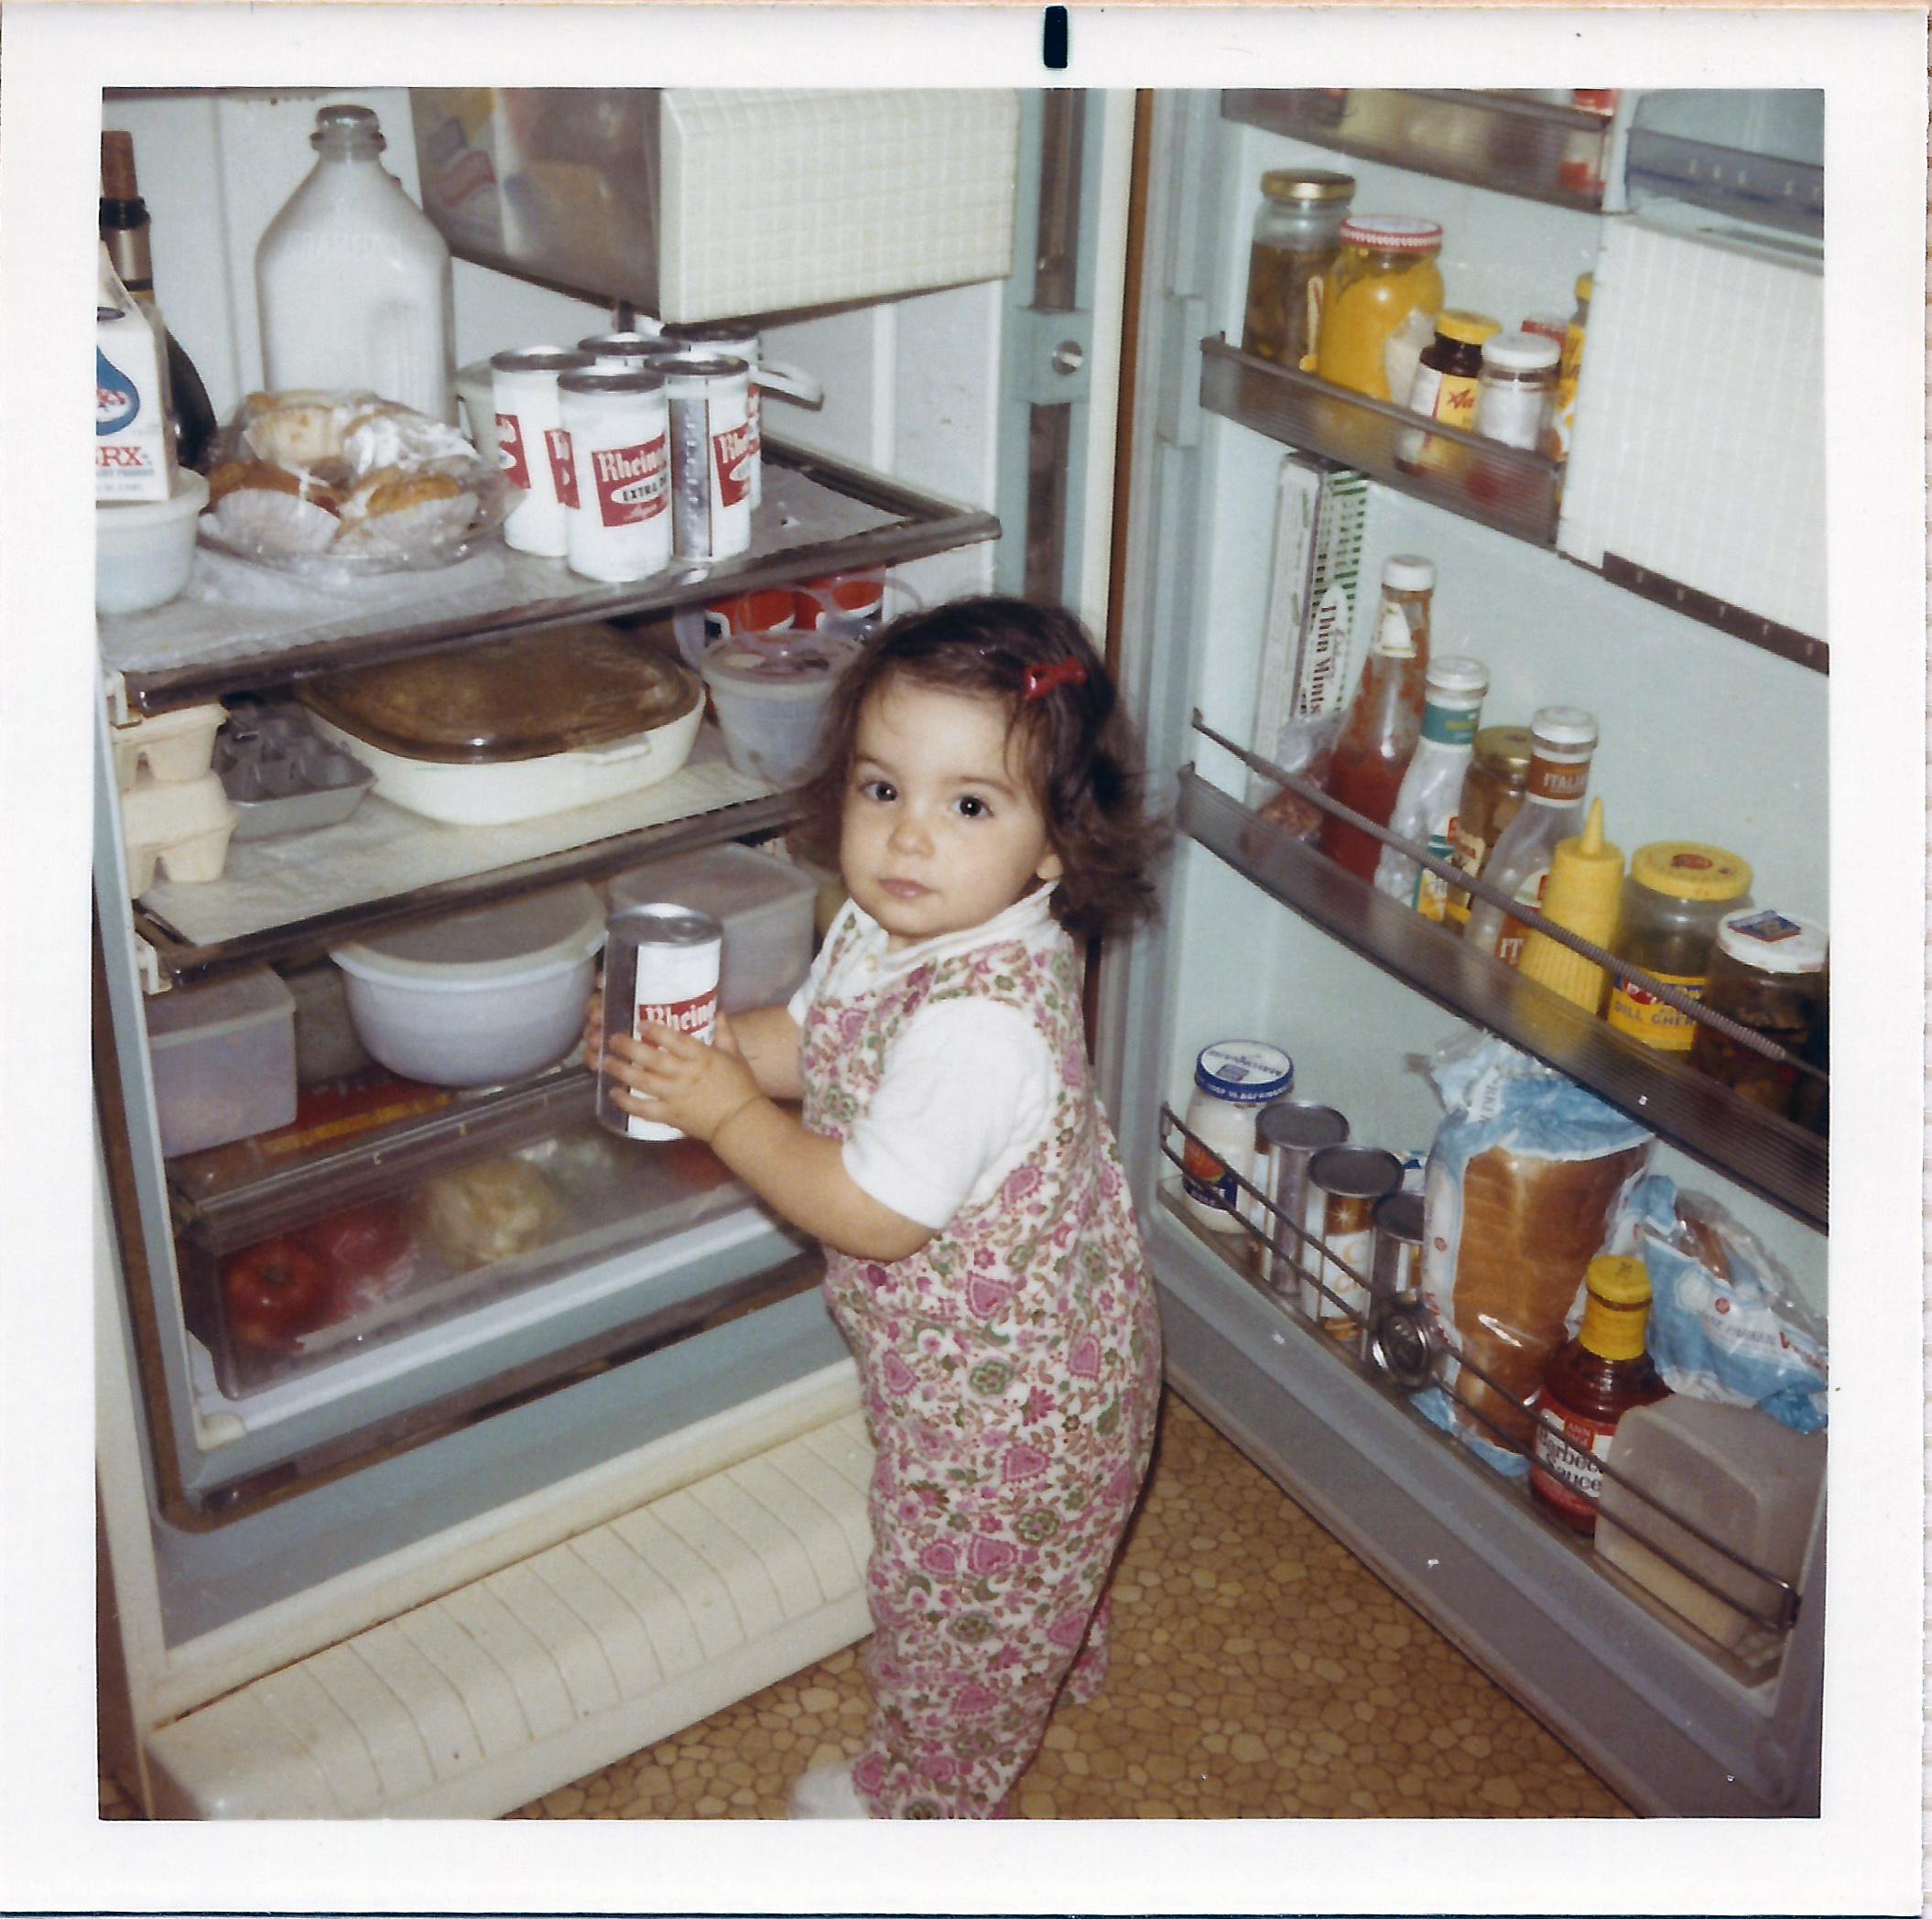 Me, aged 2, getting a Rheingold beer.